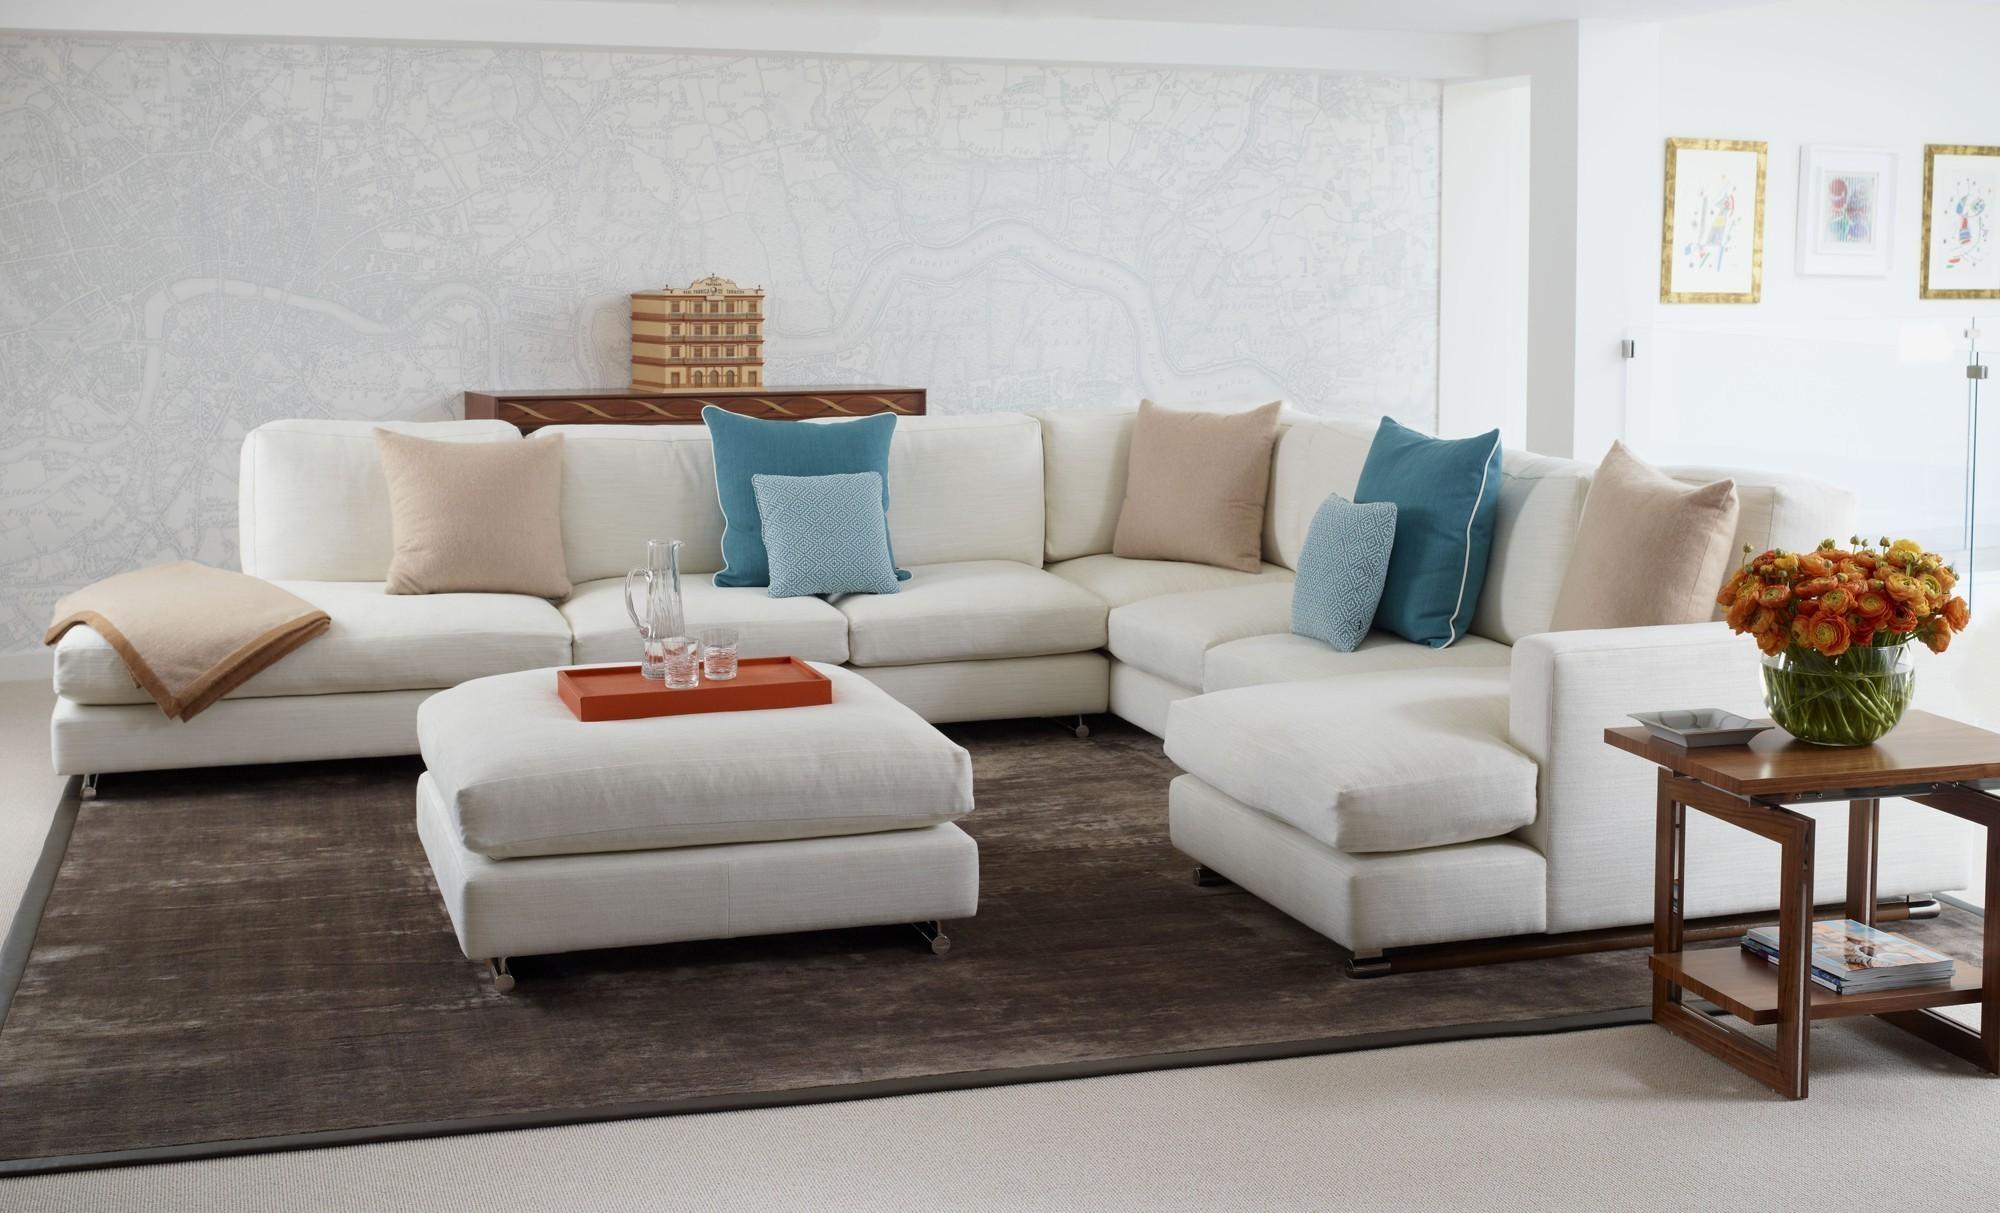 Small L Shaped Sofa | Sofa Gallery | Kengire Regarding Small L Shaped Sofas  (Image